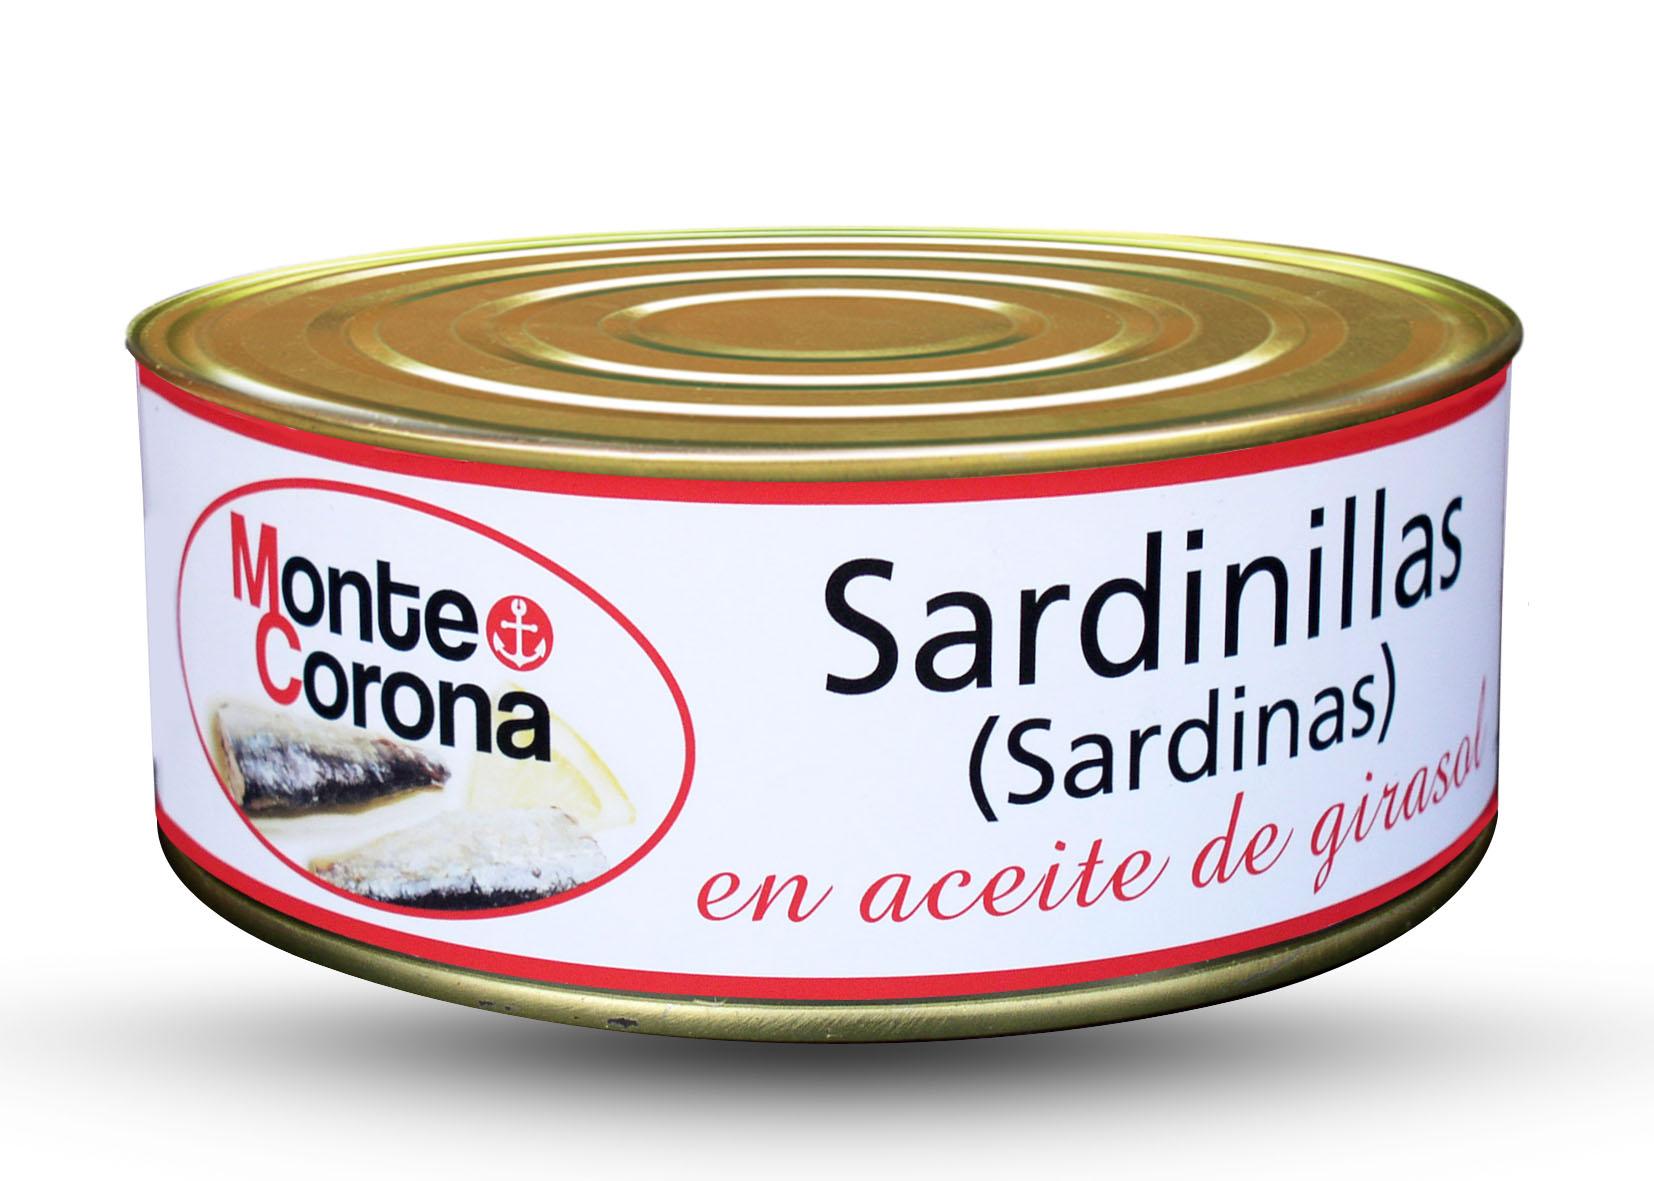 Sardinillas - Conservas Monte Corona